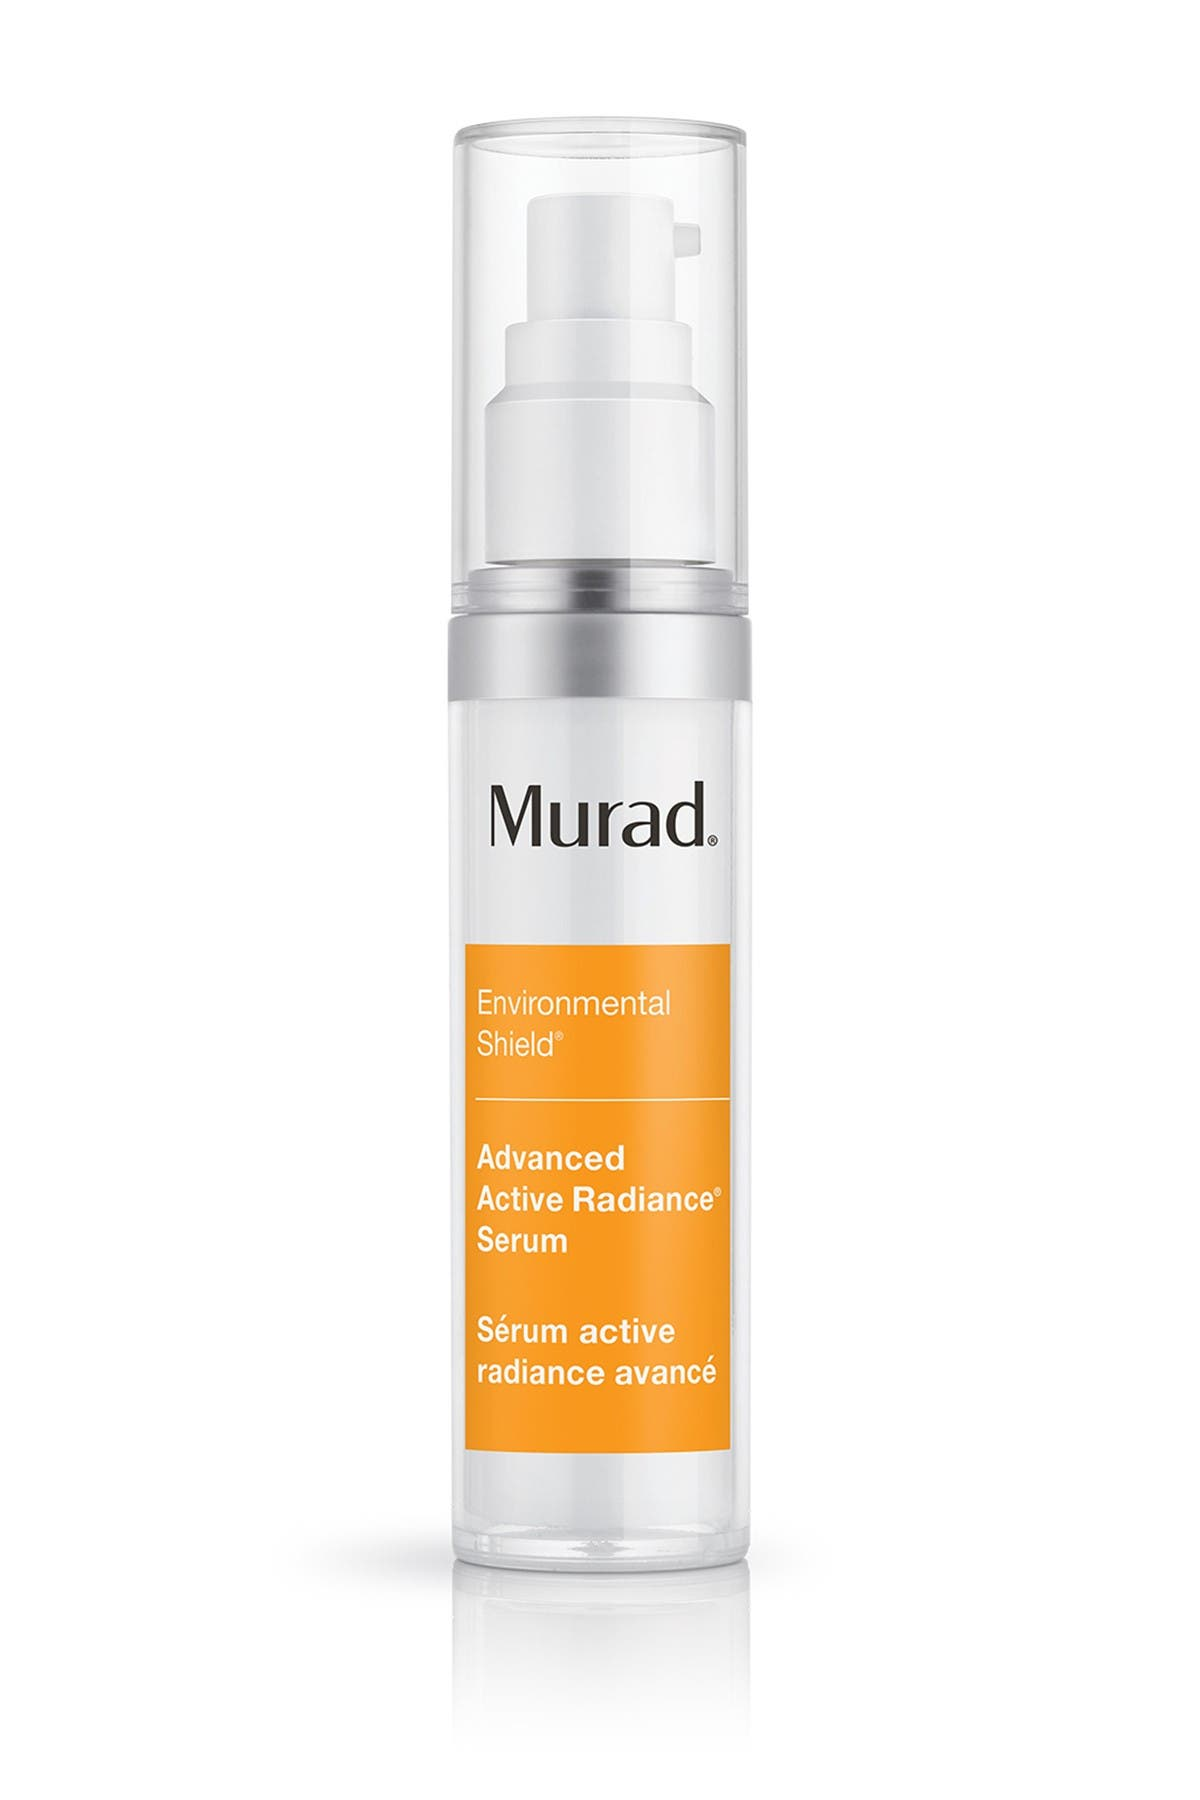 Image of Murad Advanced Active Radiance Serum